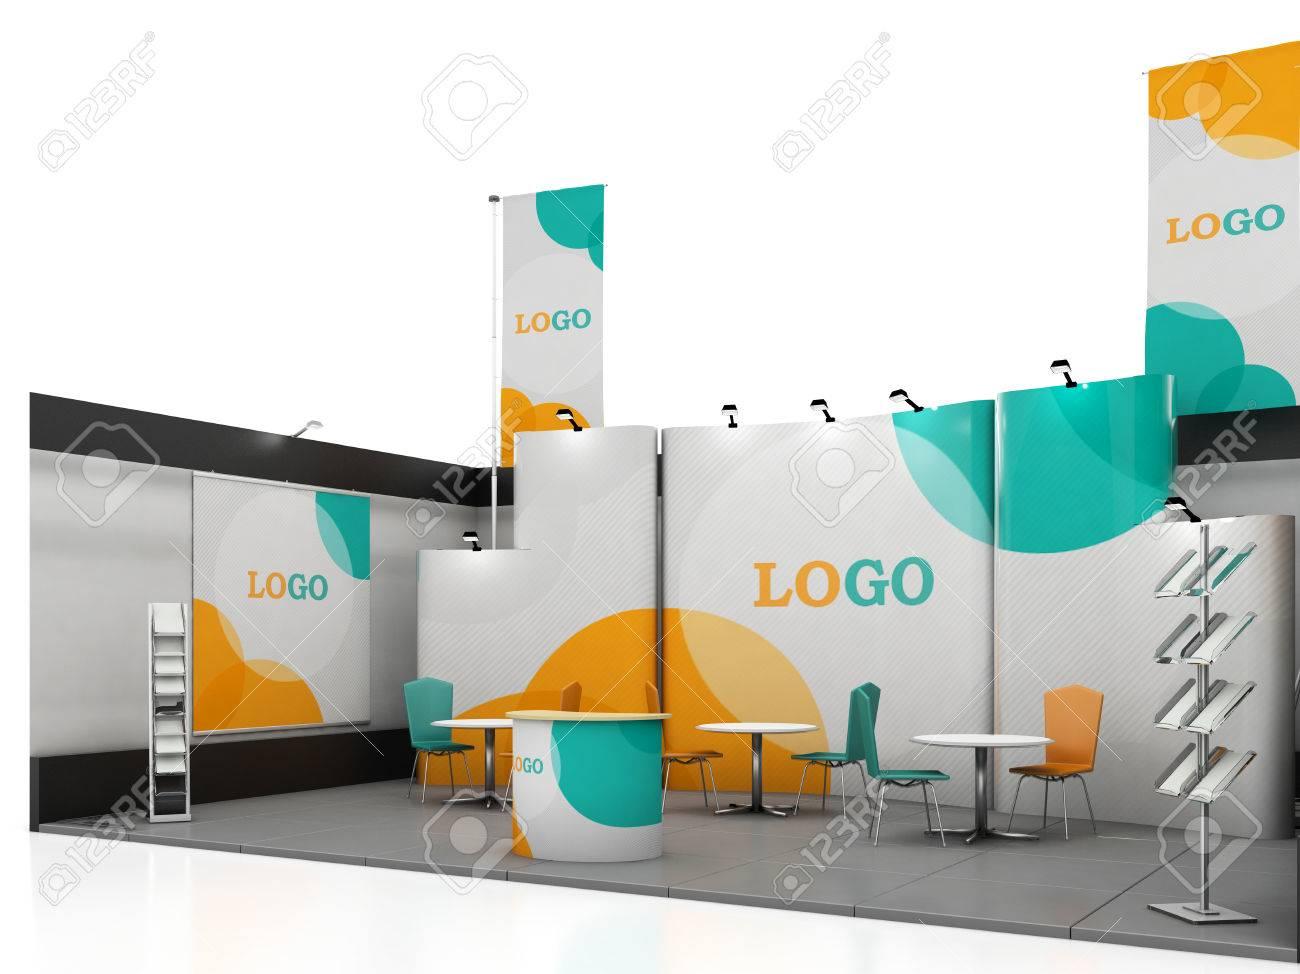 Exhibition Stand Design Graphic : Blank creative exhibition stand design with color shapes booth